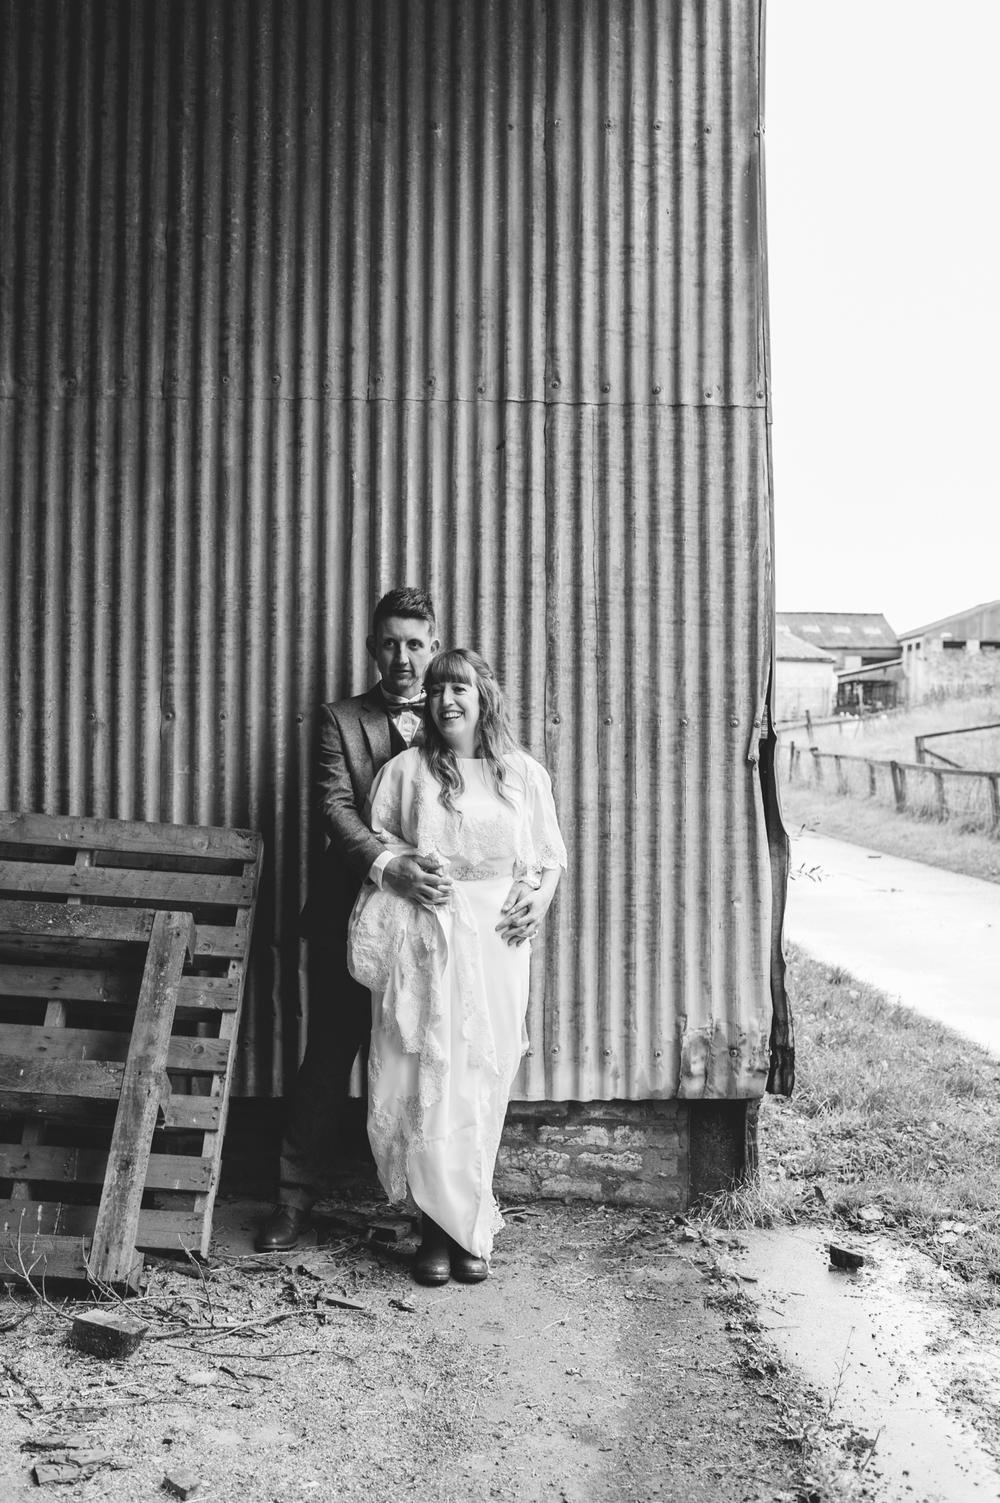 056-lisa-devine-photography-alternative-creative-wedding-photography-glasgow-scotland-uk.JPG